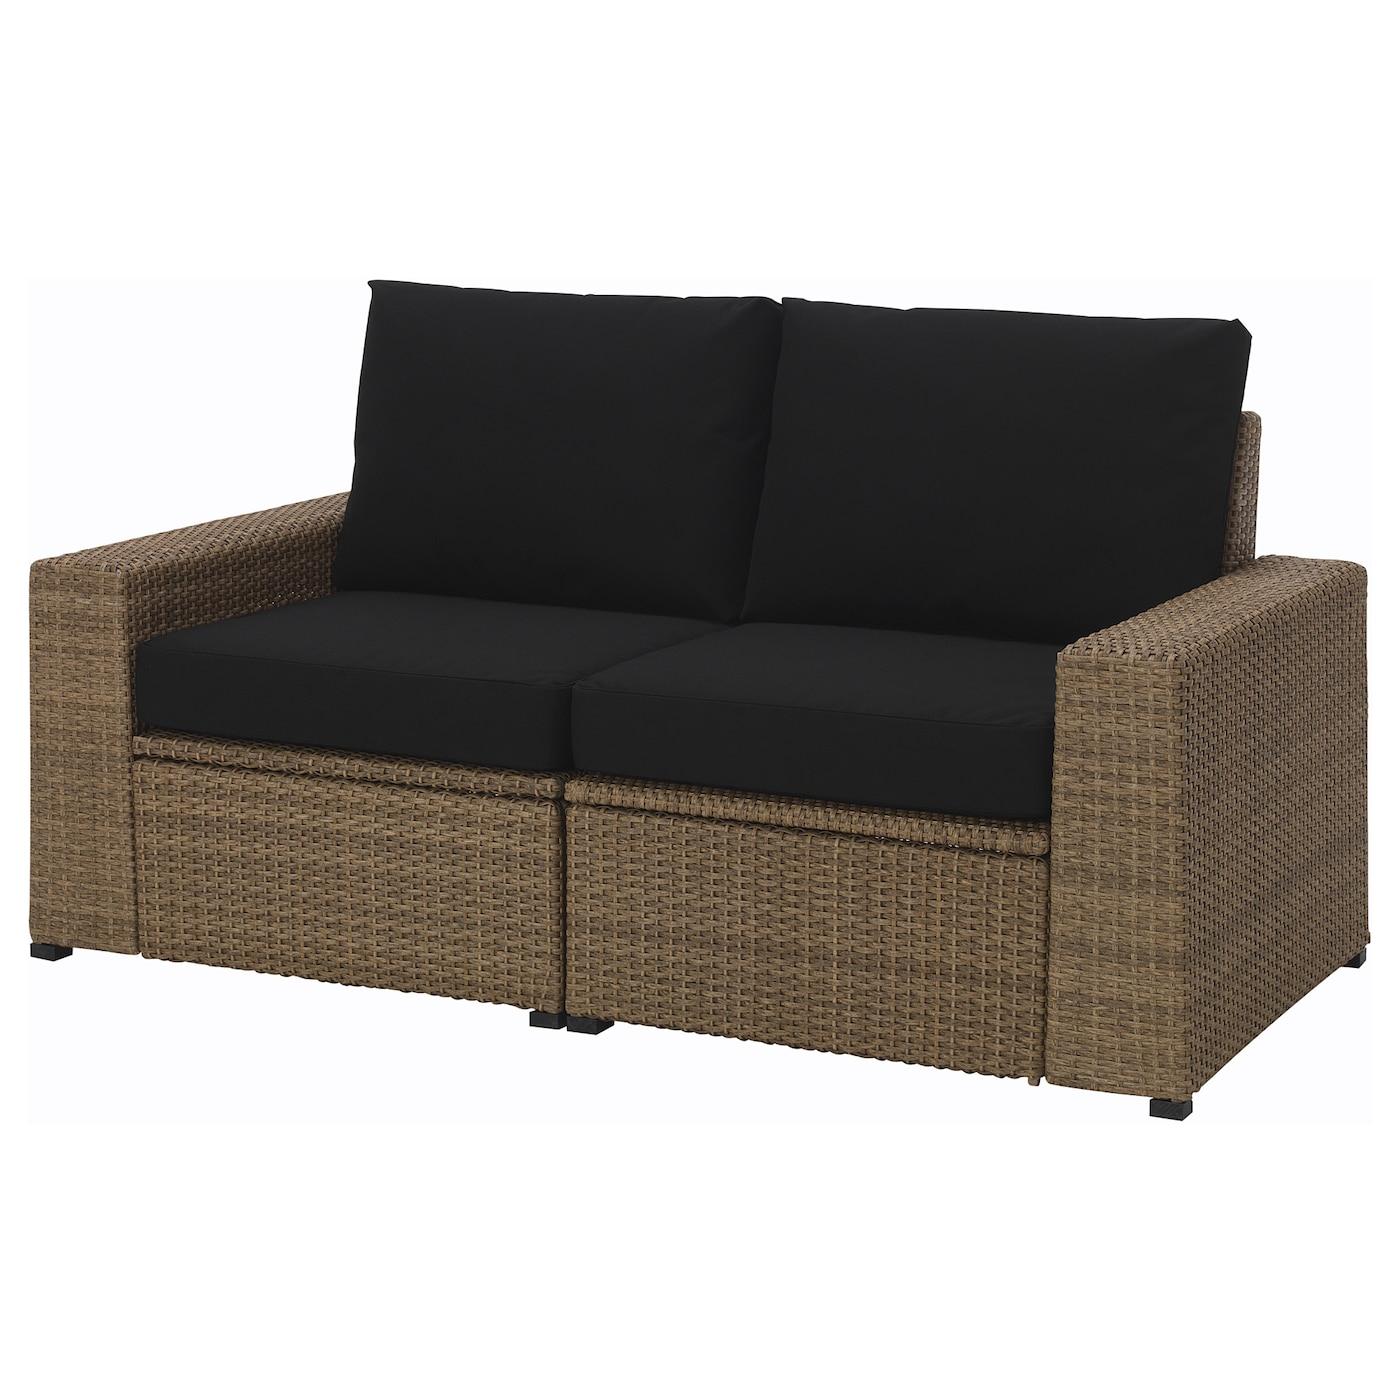 soller n canap 2 places ext rieur brun kungs noir 161 x 82 x 87 cm ikea. Black Bedroom Furniture Sets. Home Design Ideas